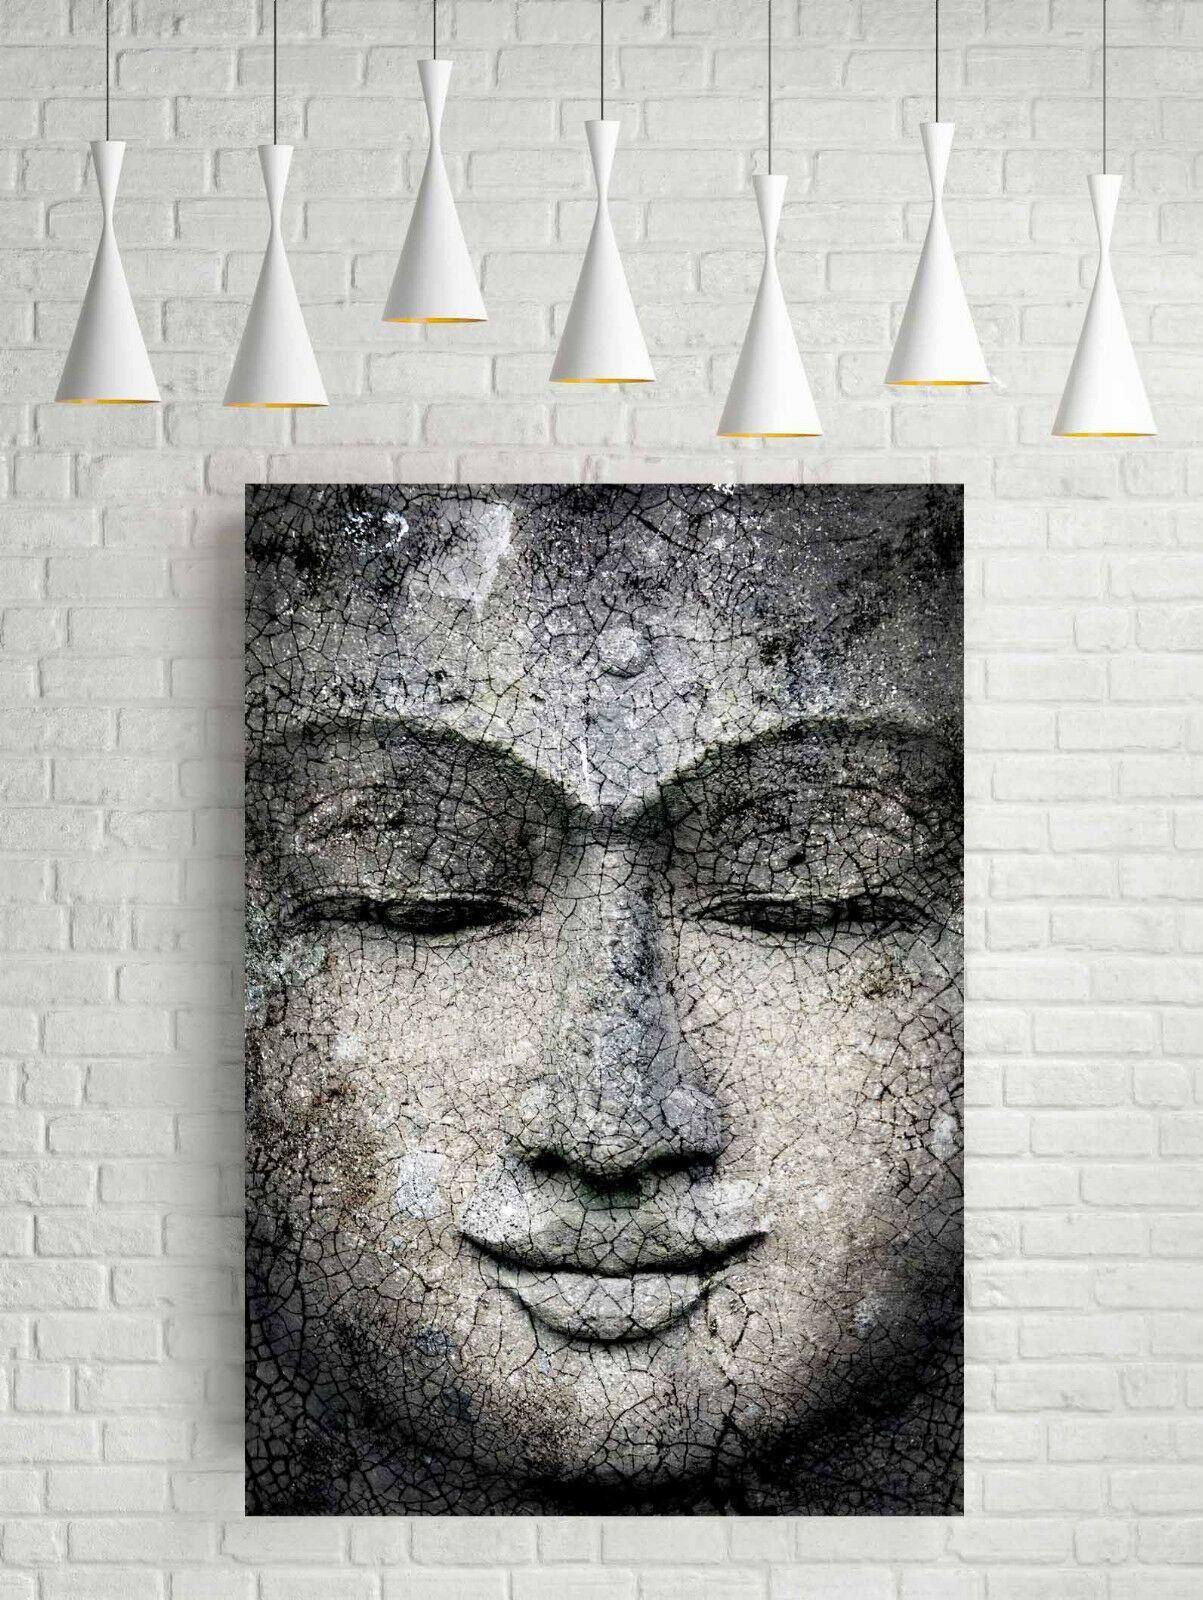 STUNNING RIASSUNTO BUDDHA Home Decor dipinto a mano HD Dipinti Stampa Olio su tela Wall Art Immagini 200727